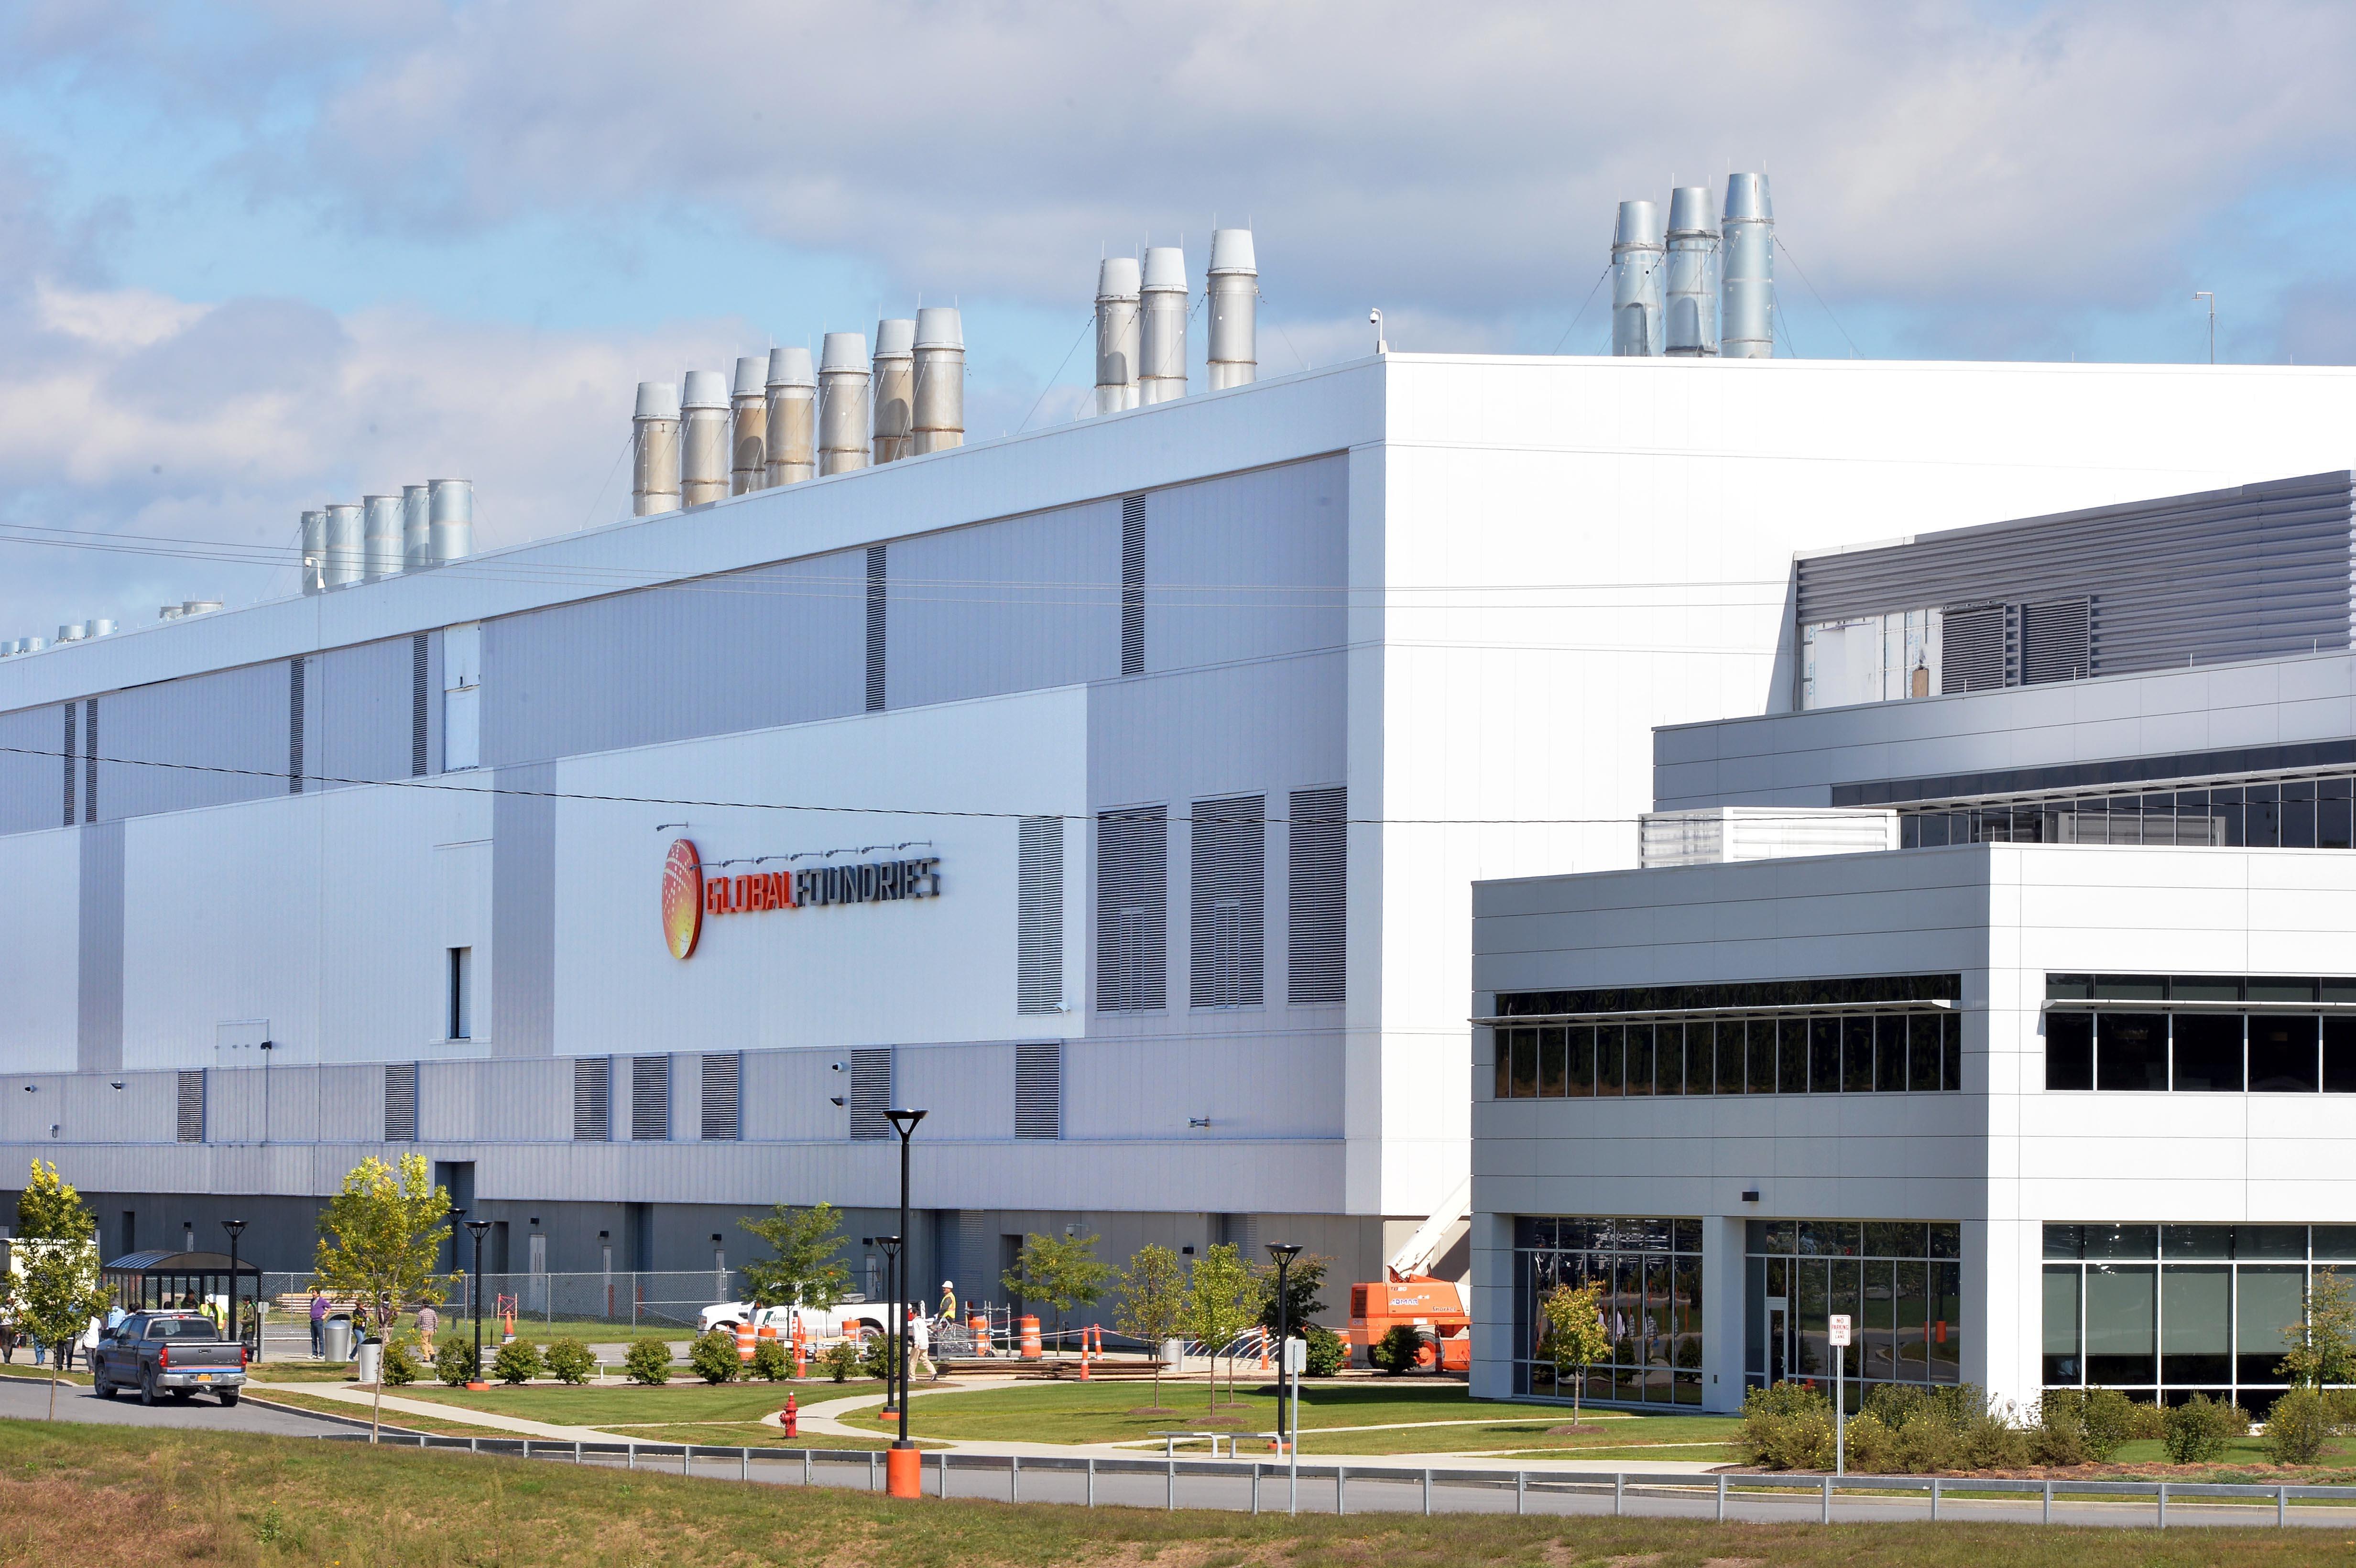 GlobalFoundries: No layoffs in IBM chip units - Washington Times